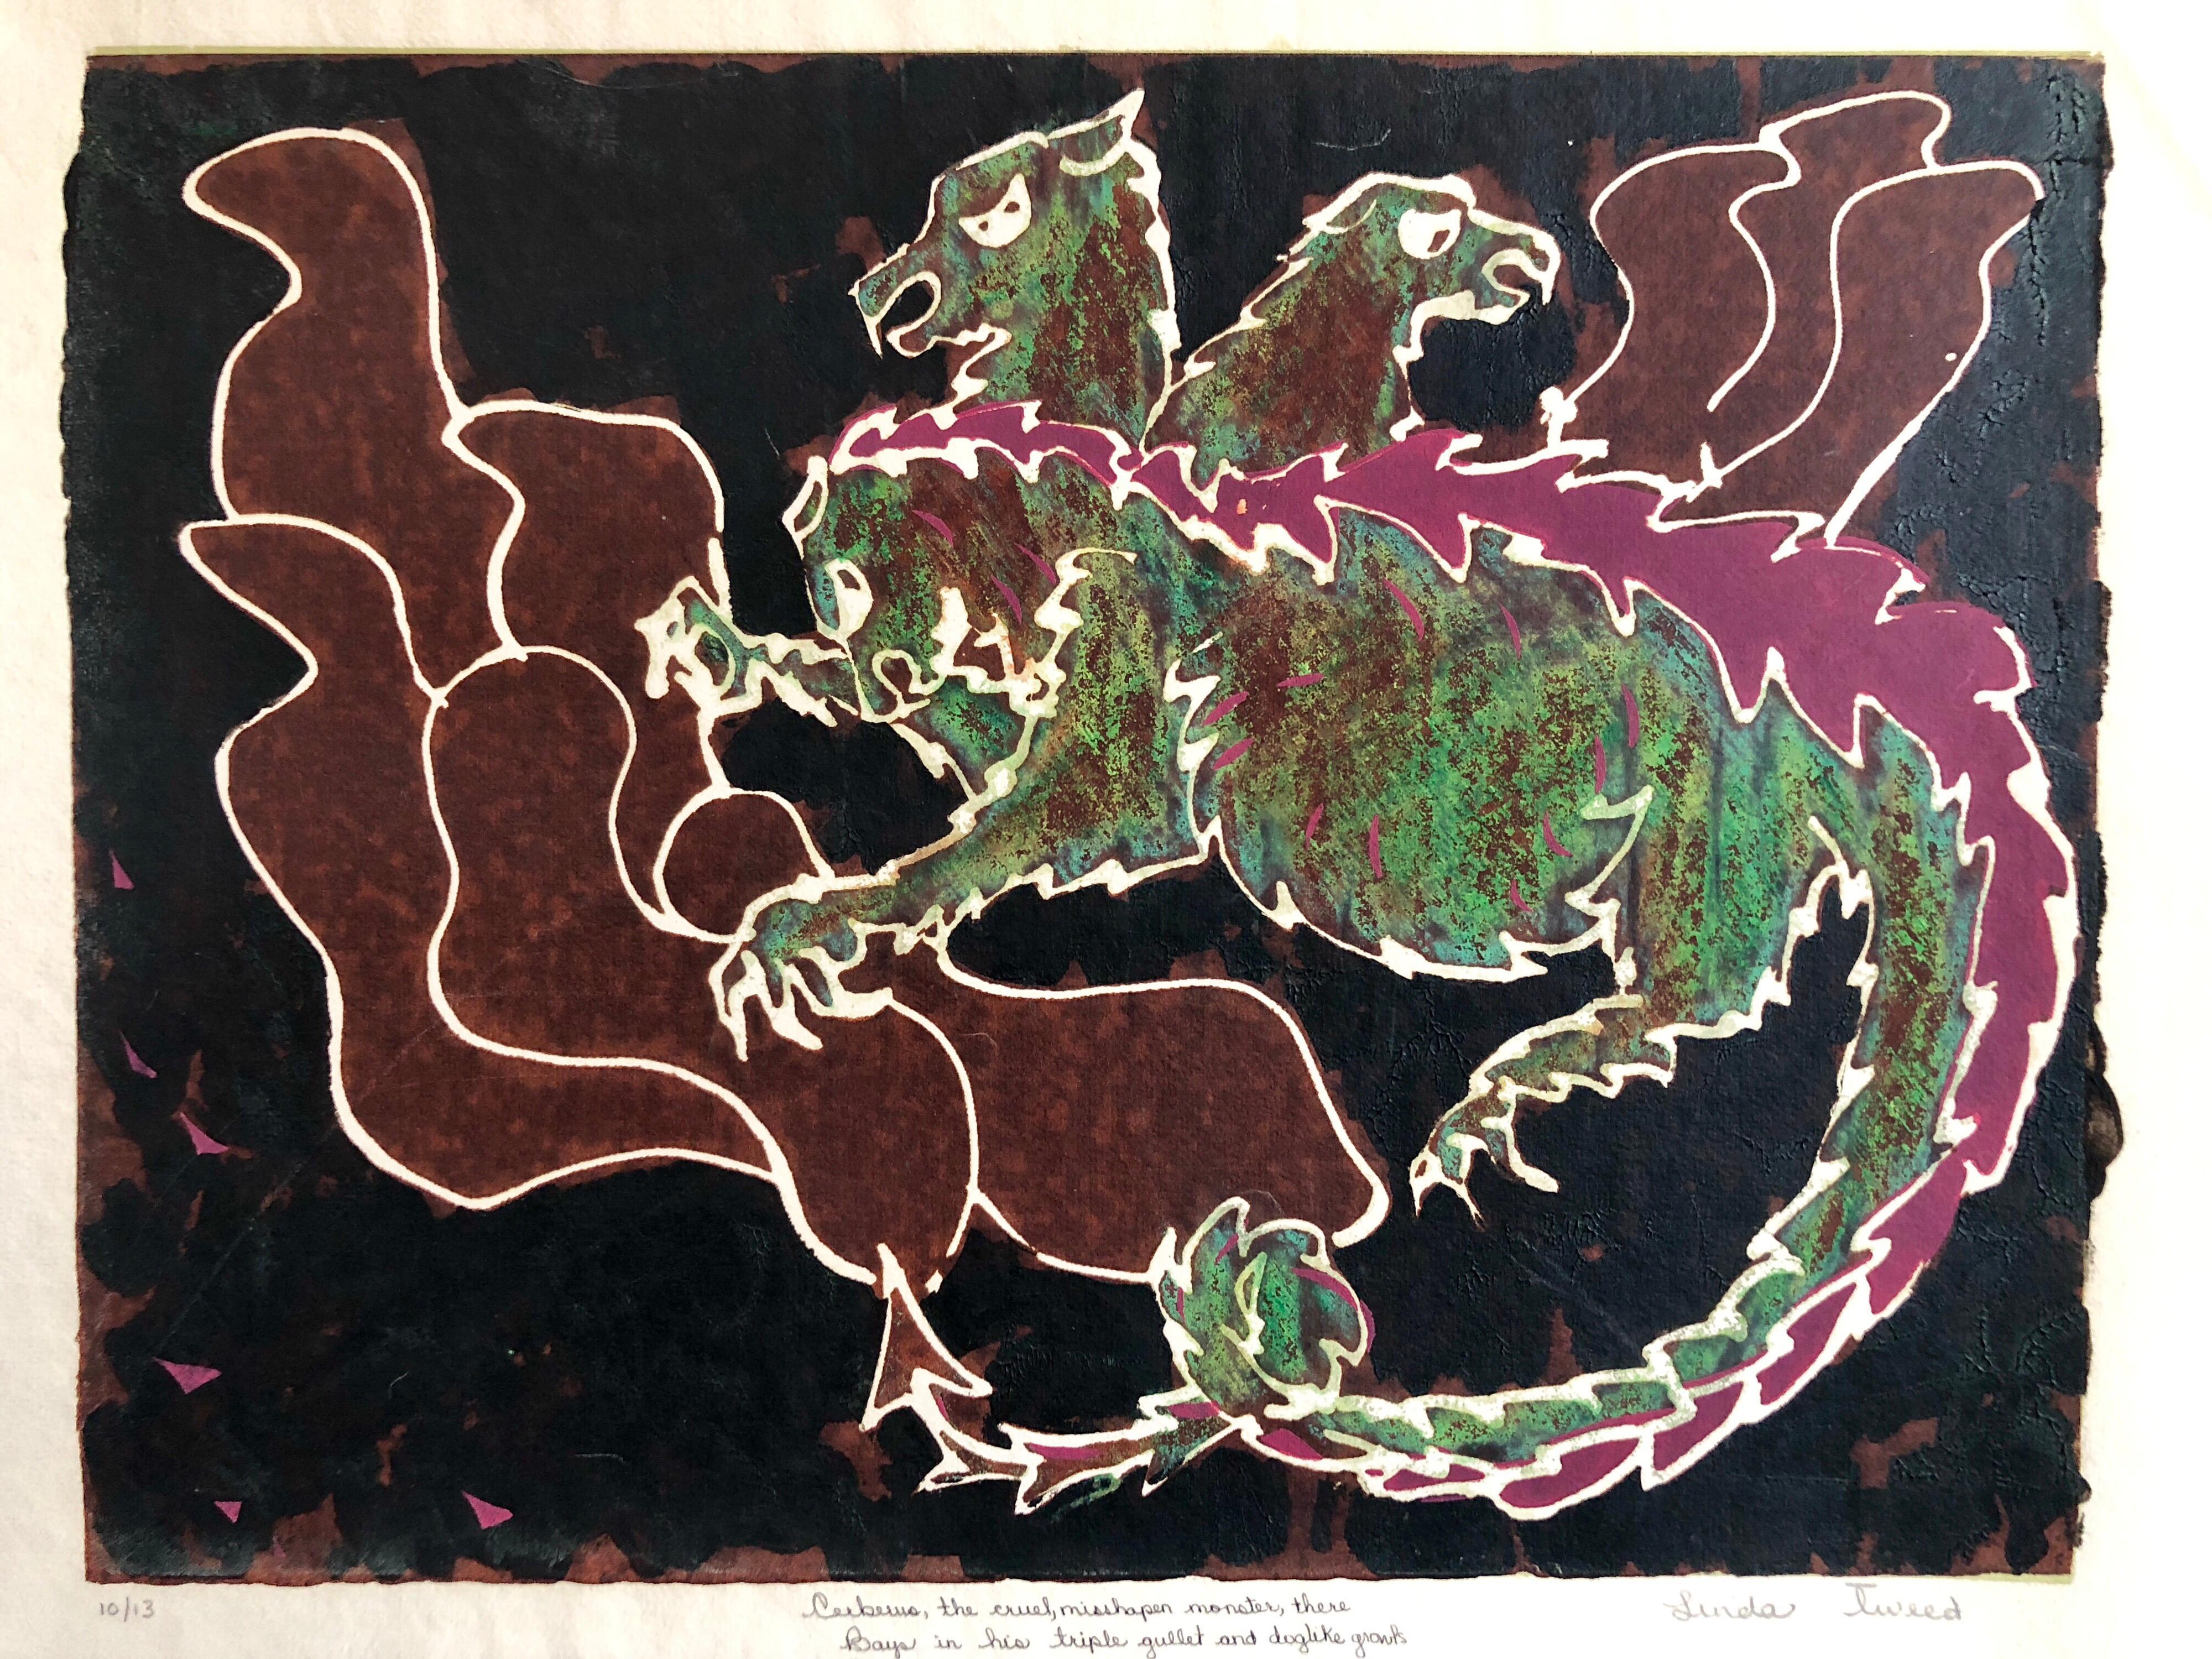 Vintage Vibrant Mod Mythological Dragon Psychedelic Woodblock Woodcut Print